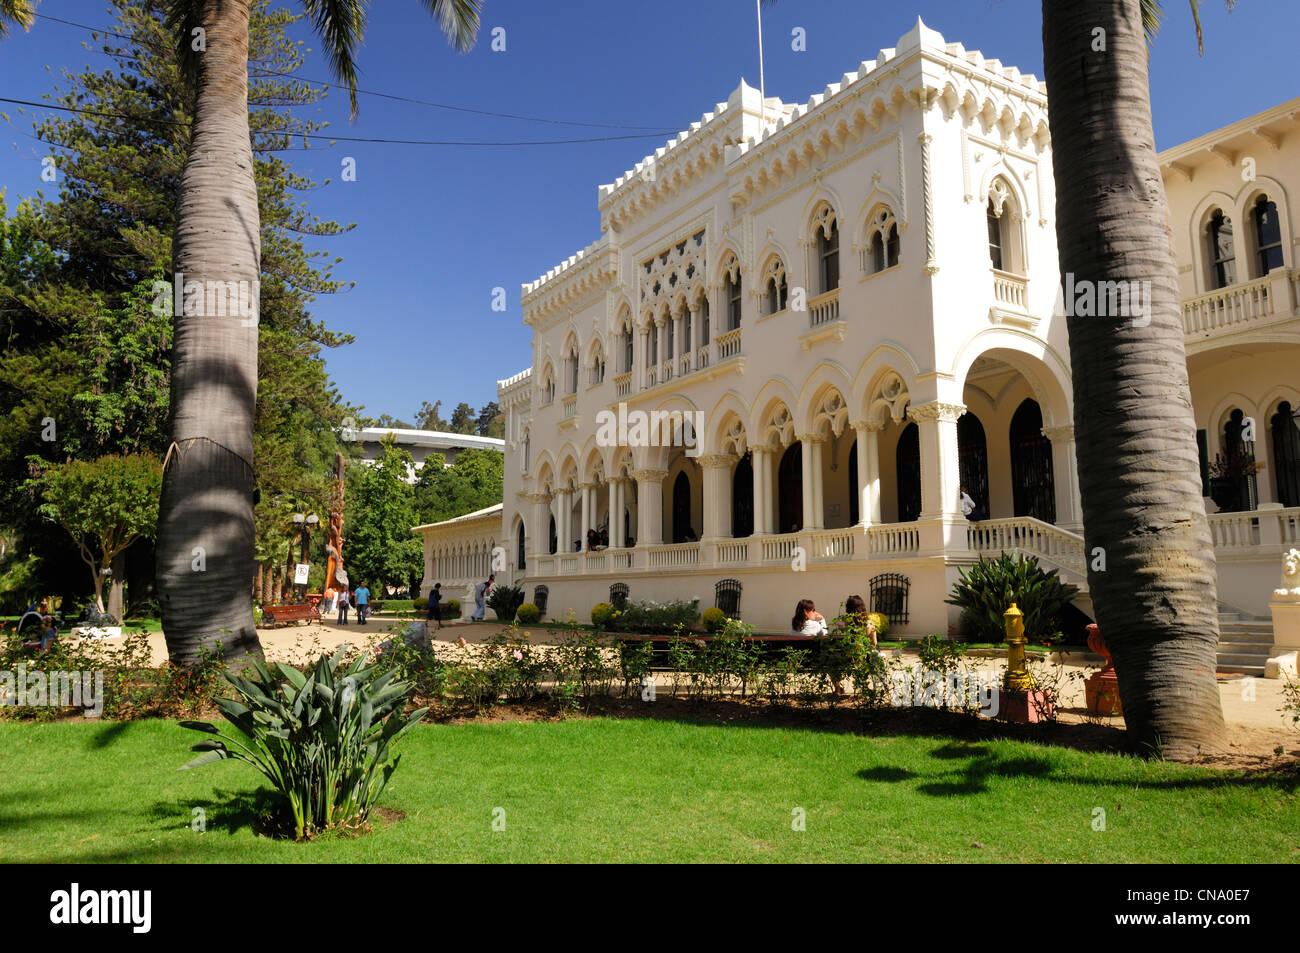 Le Chili, Valparaiso, Vina del Mar, Vergara Palace dans le parc Quinta Vergara dans Vina del Mar Banque D'Images